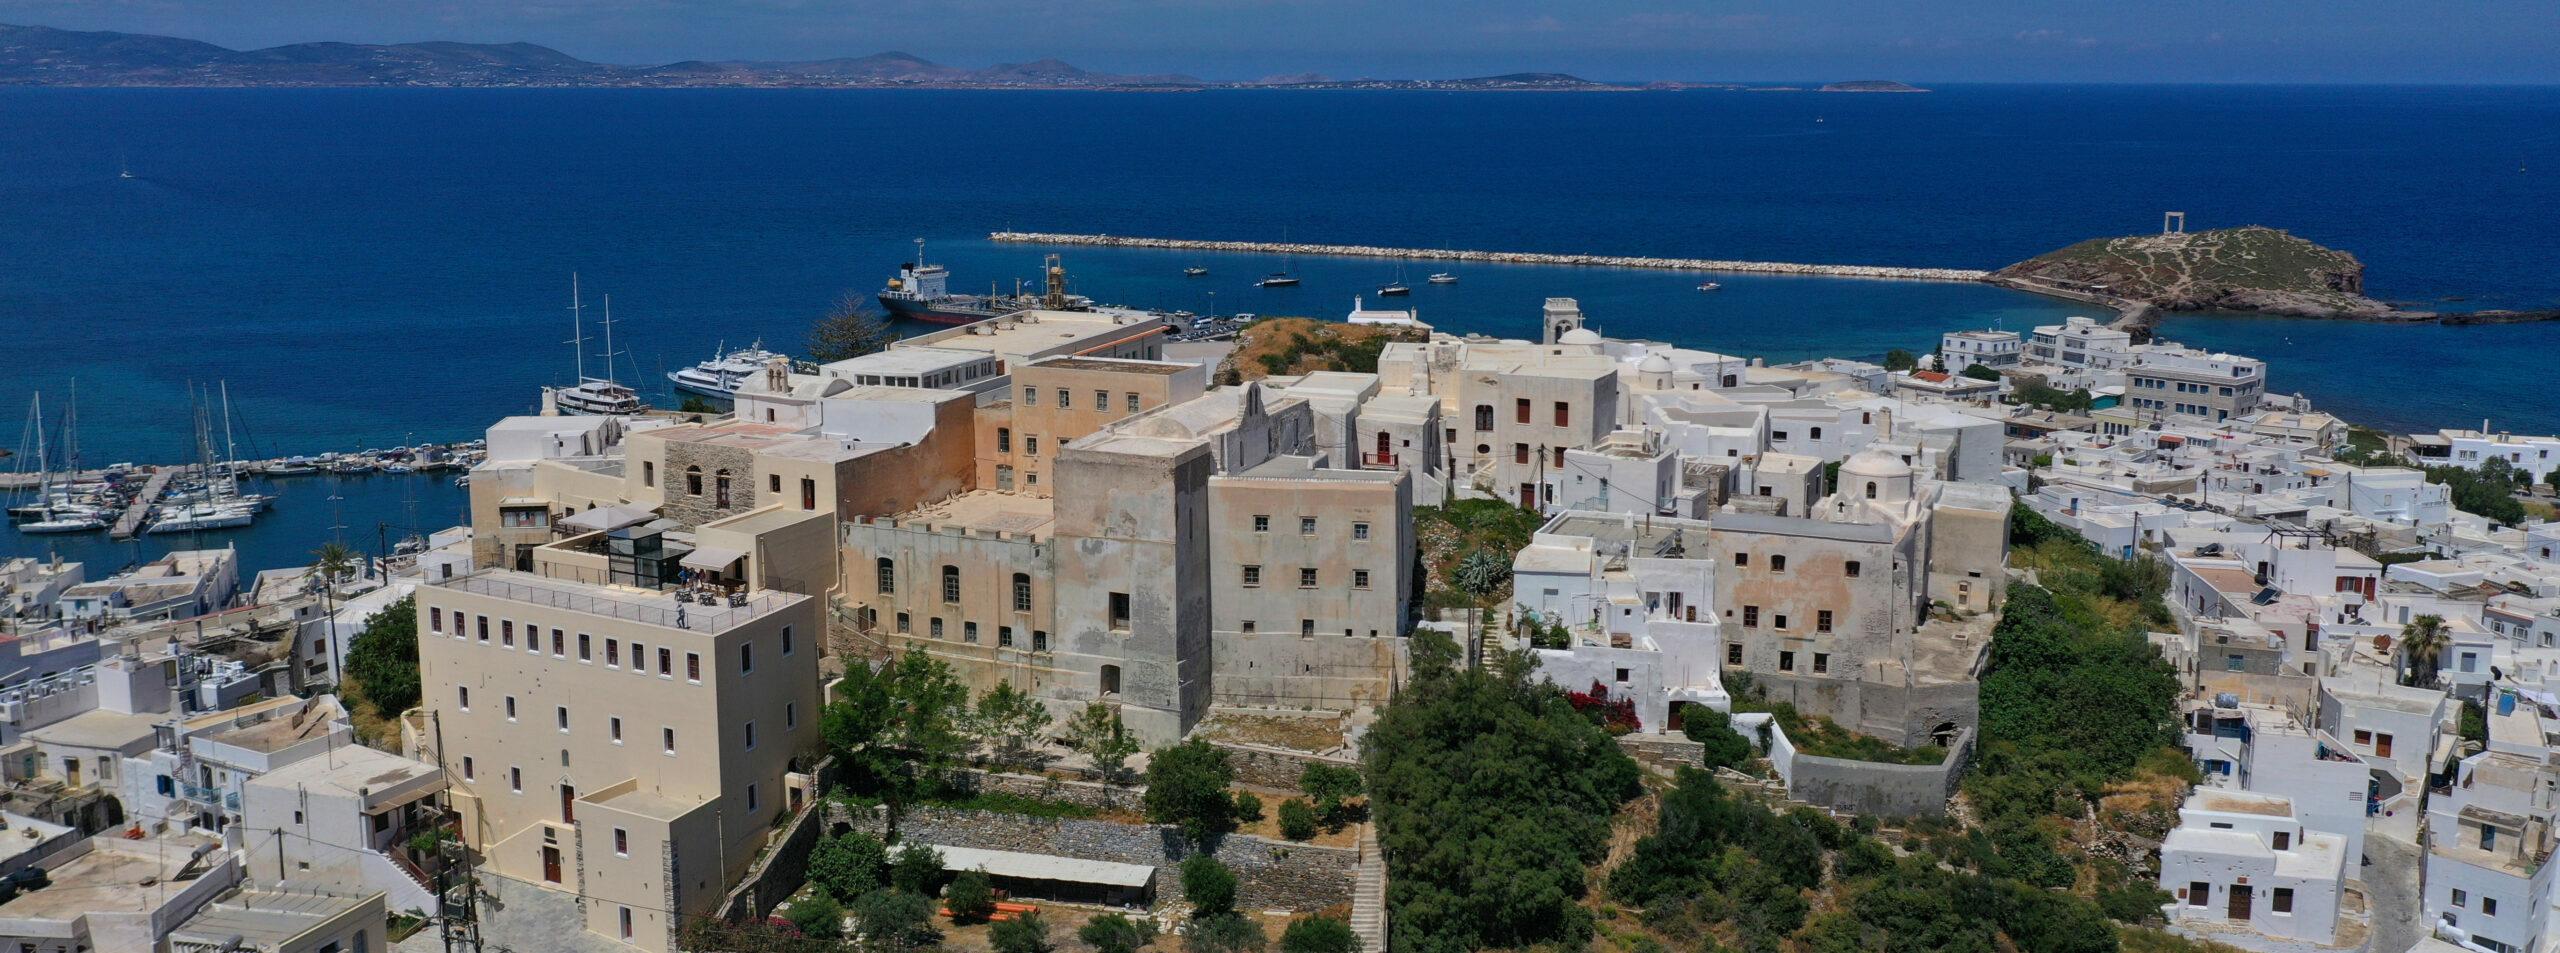 Naxos: The Venetian castle